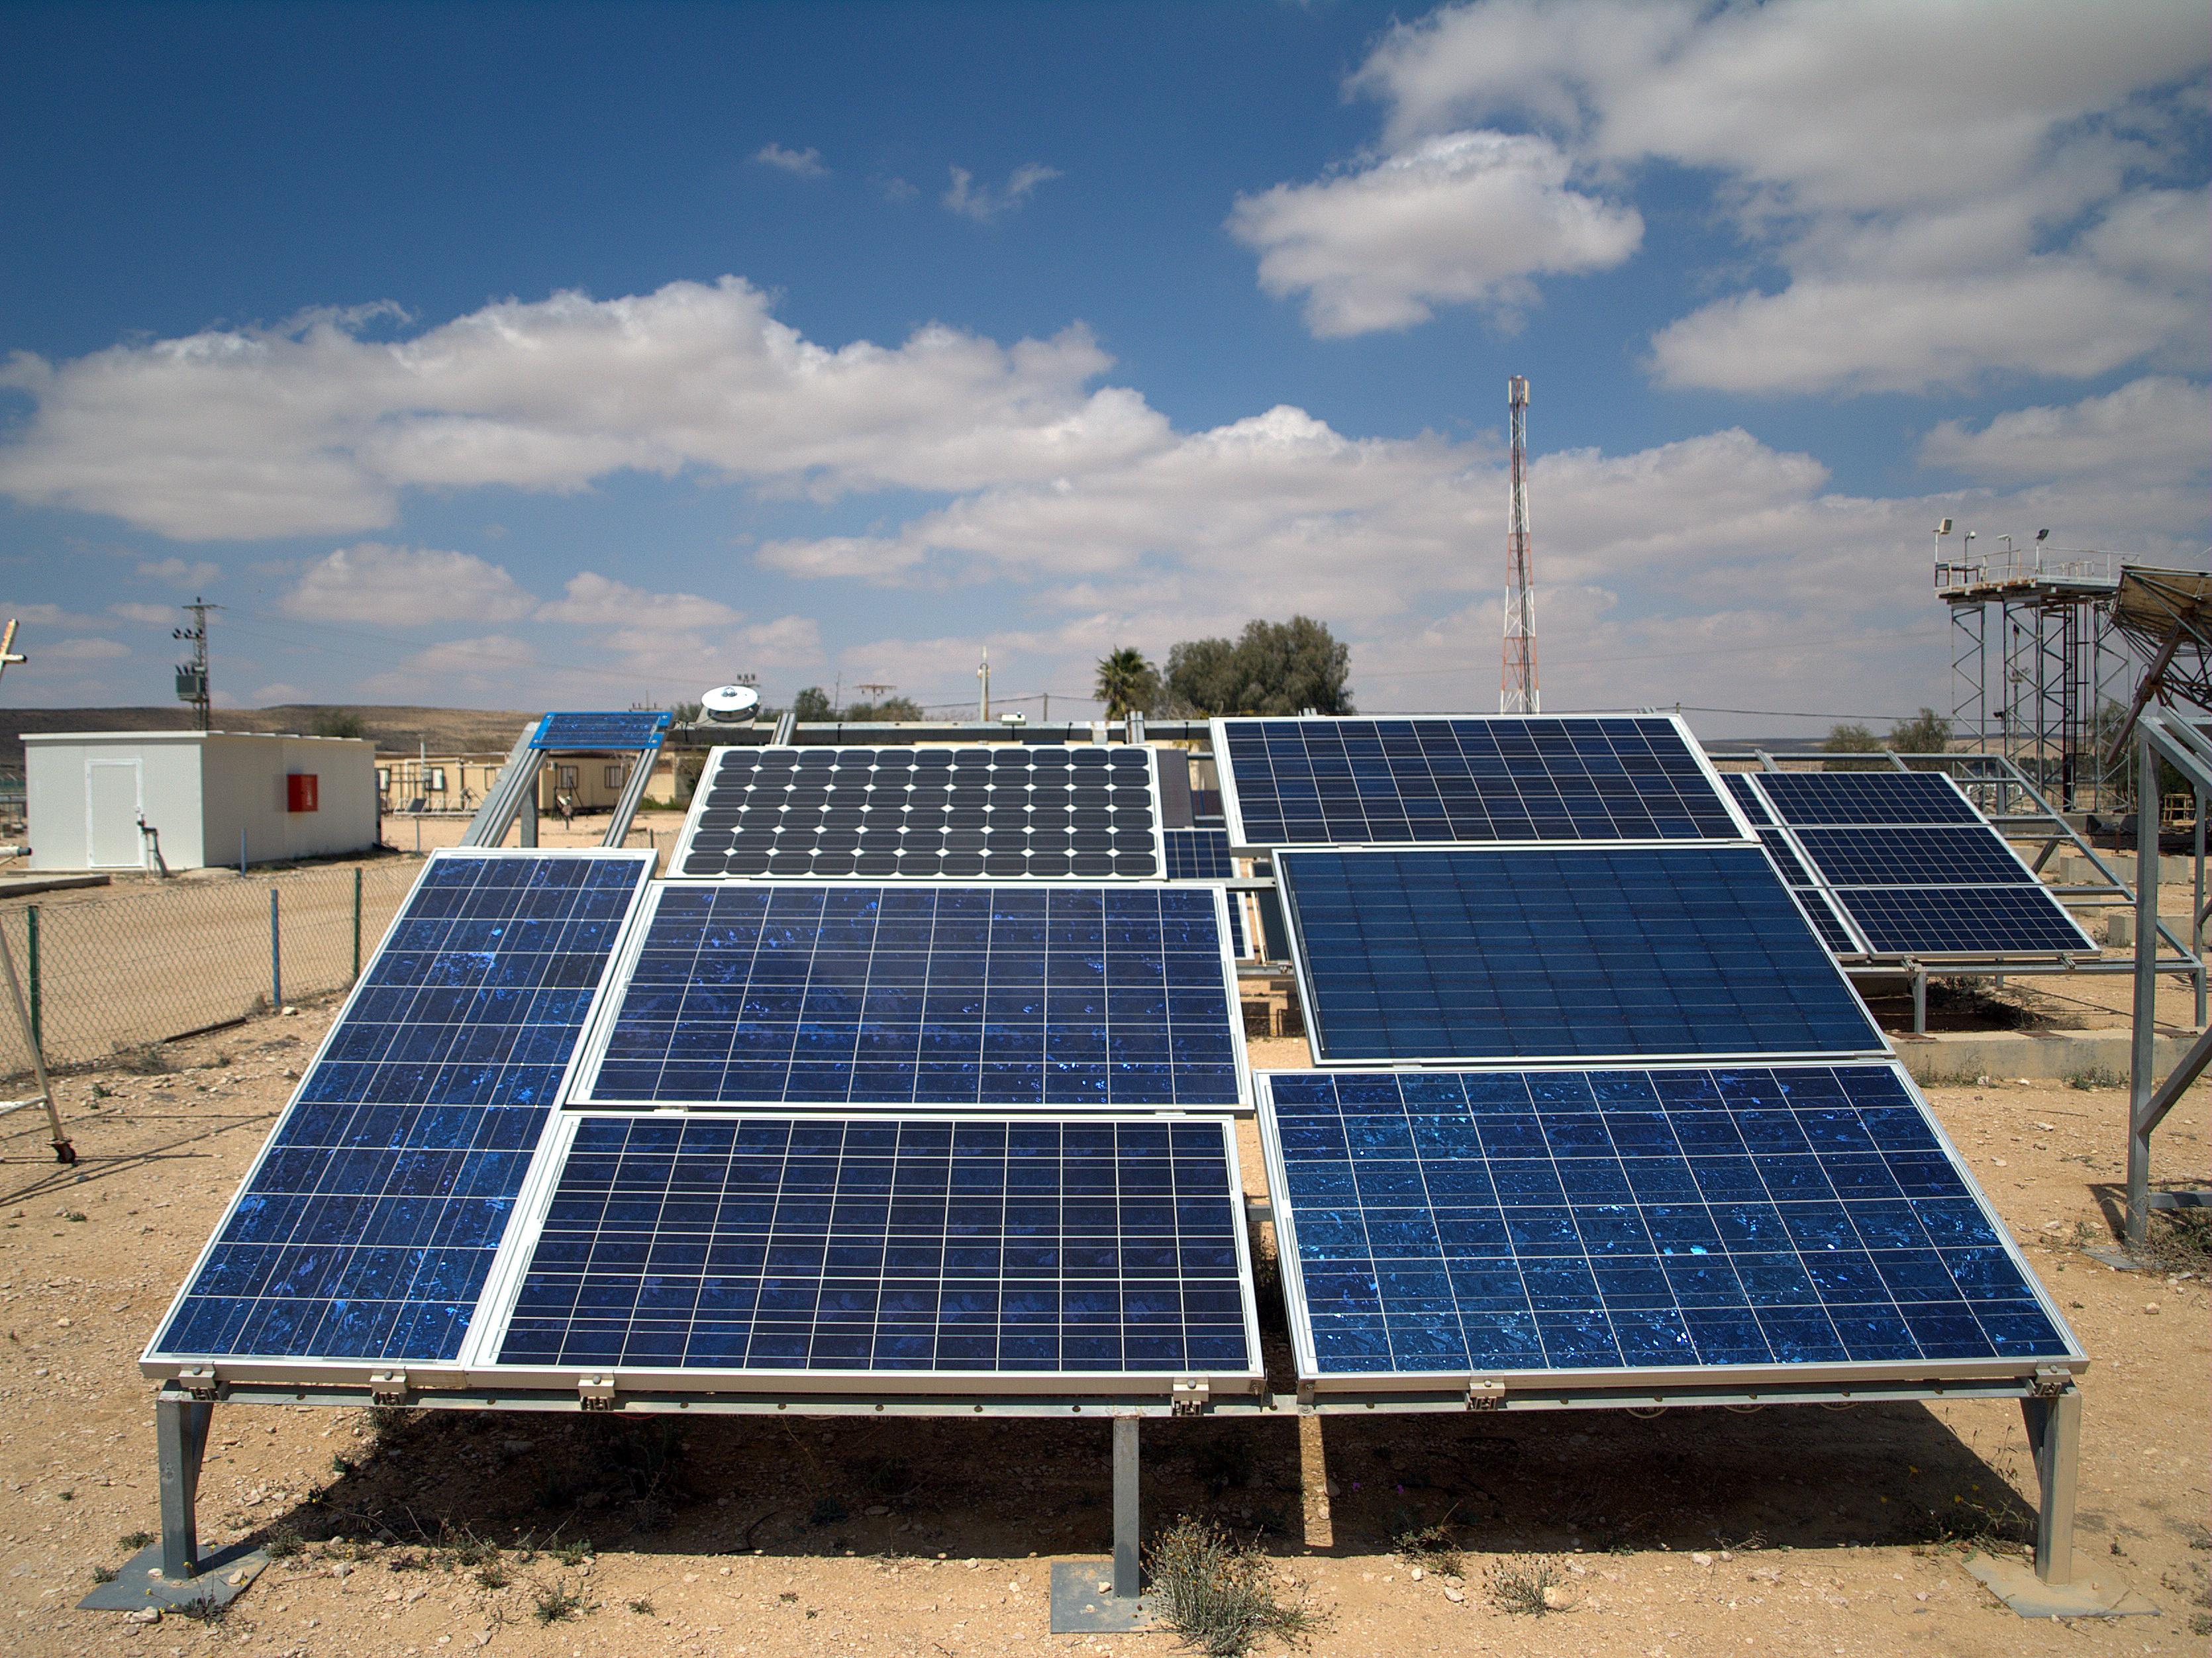 Photovoltaic arrays at the Israeli National Solar Energy Center